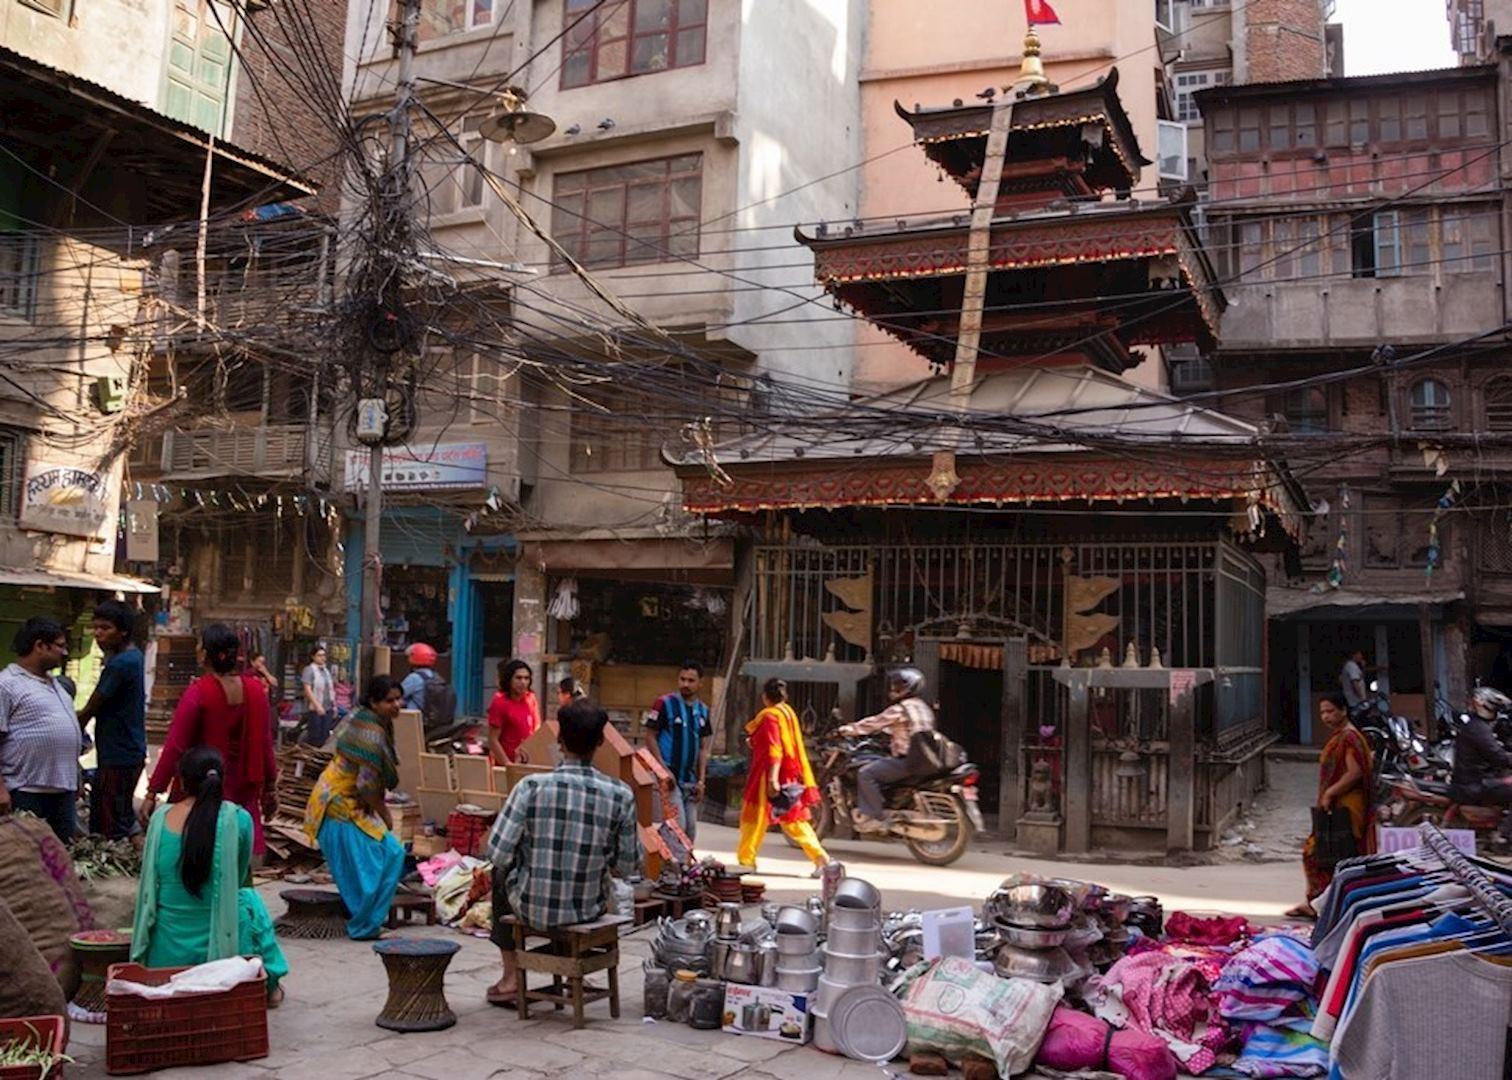 Visit Kathmandu Valley on a trip to Nepal | Audley Travel